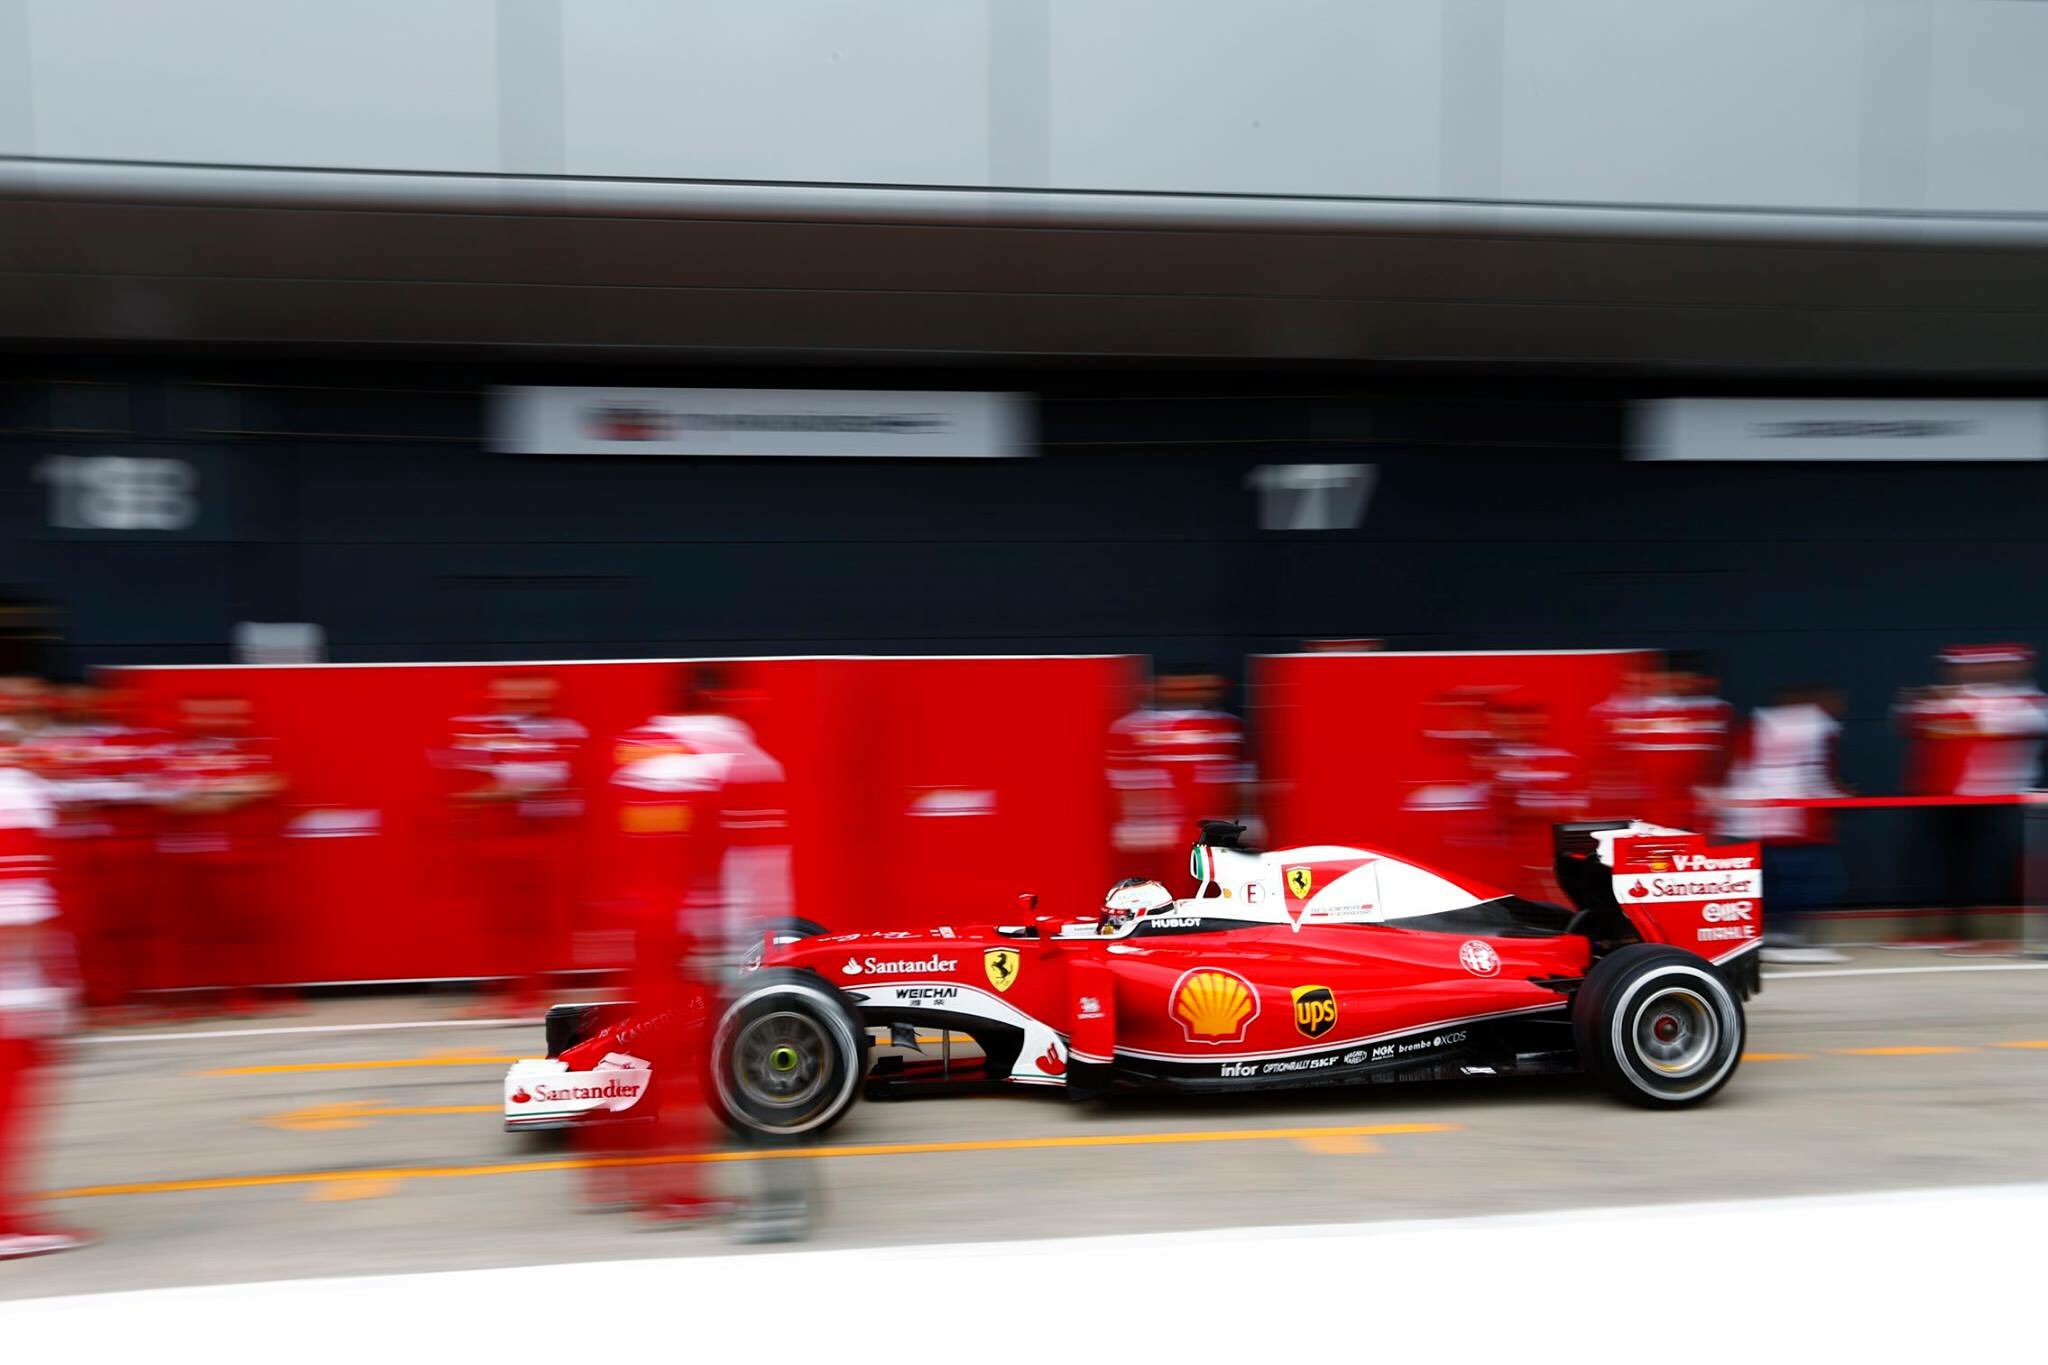 Charles Leclerc confirms Ferrari test post-Hungarian Grand Prix